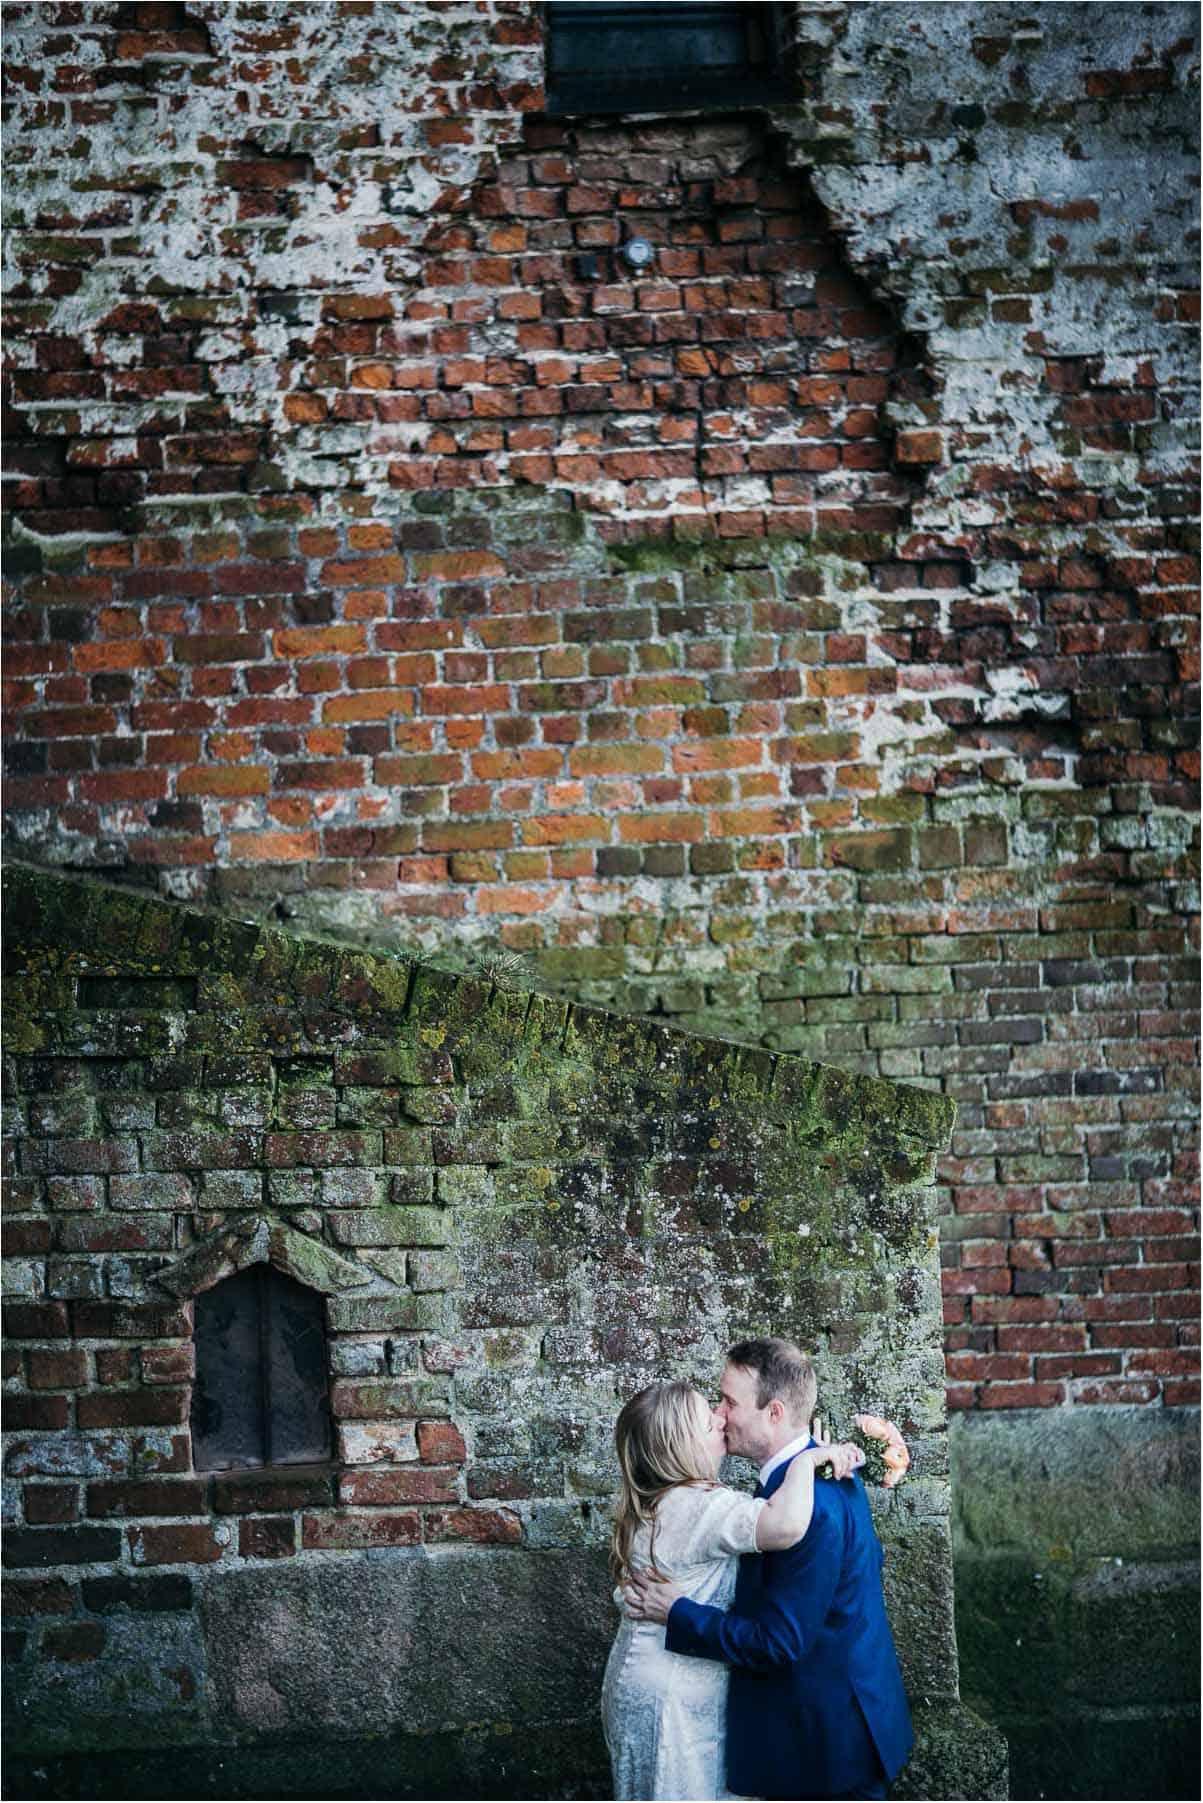 Bryllupsportrættet bryllup